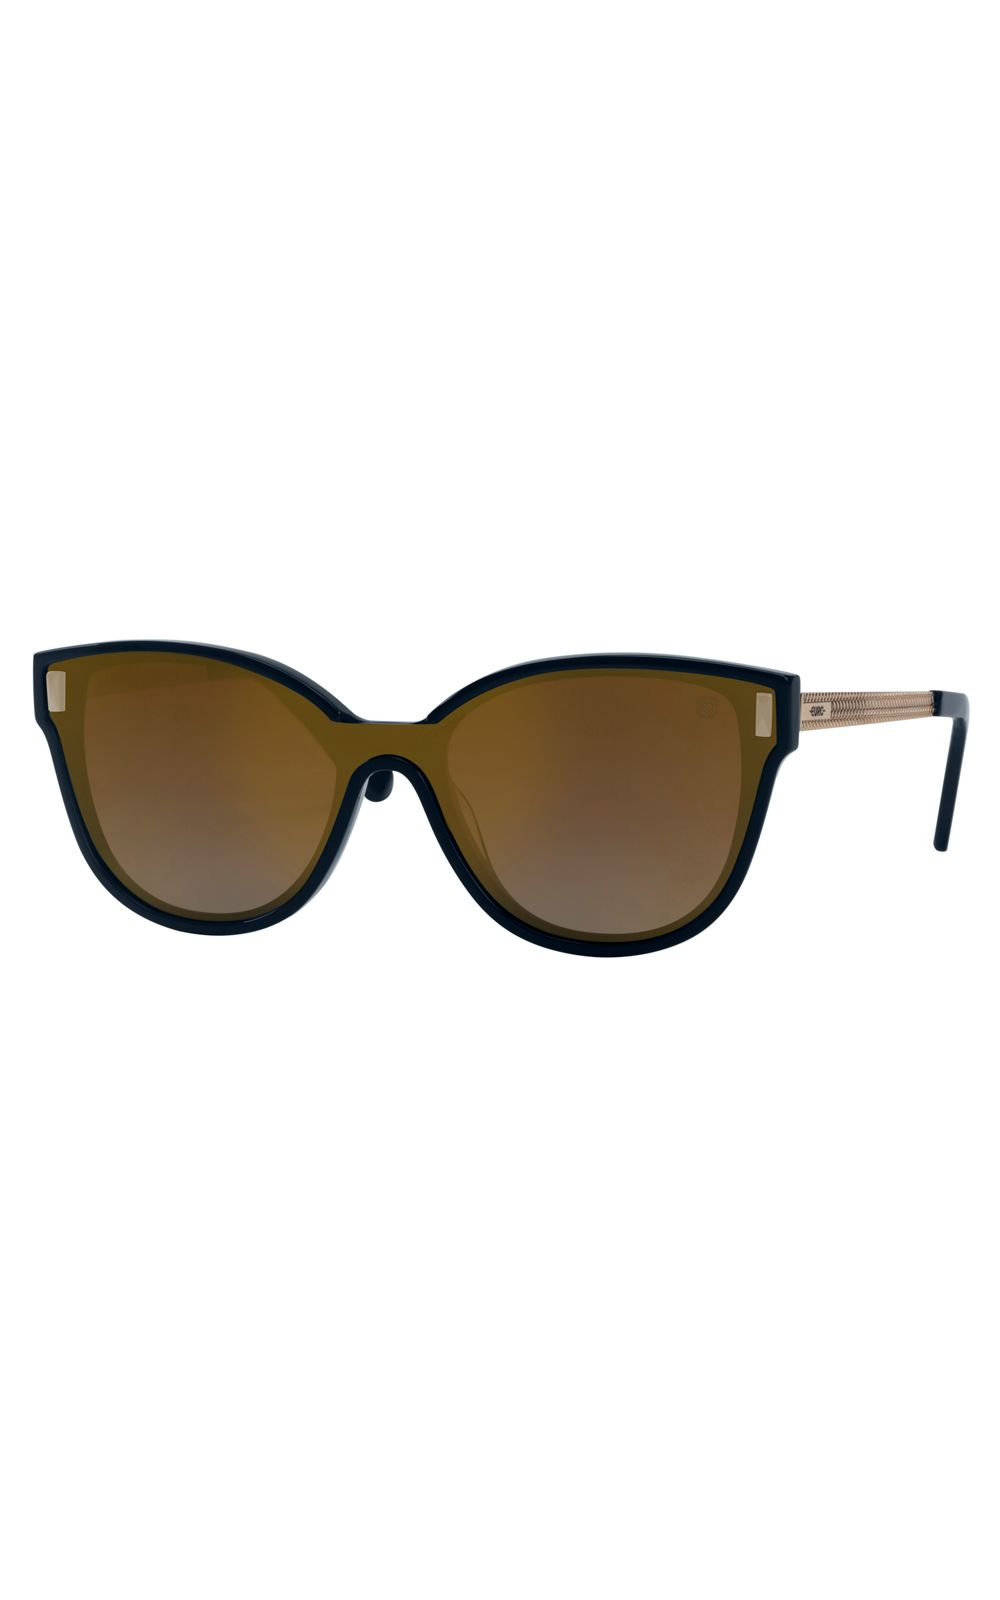 Foto 1 - Óculos Euro Unique Front Dourado E0041K1910/4D